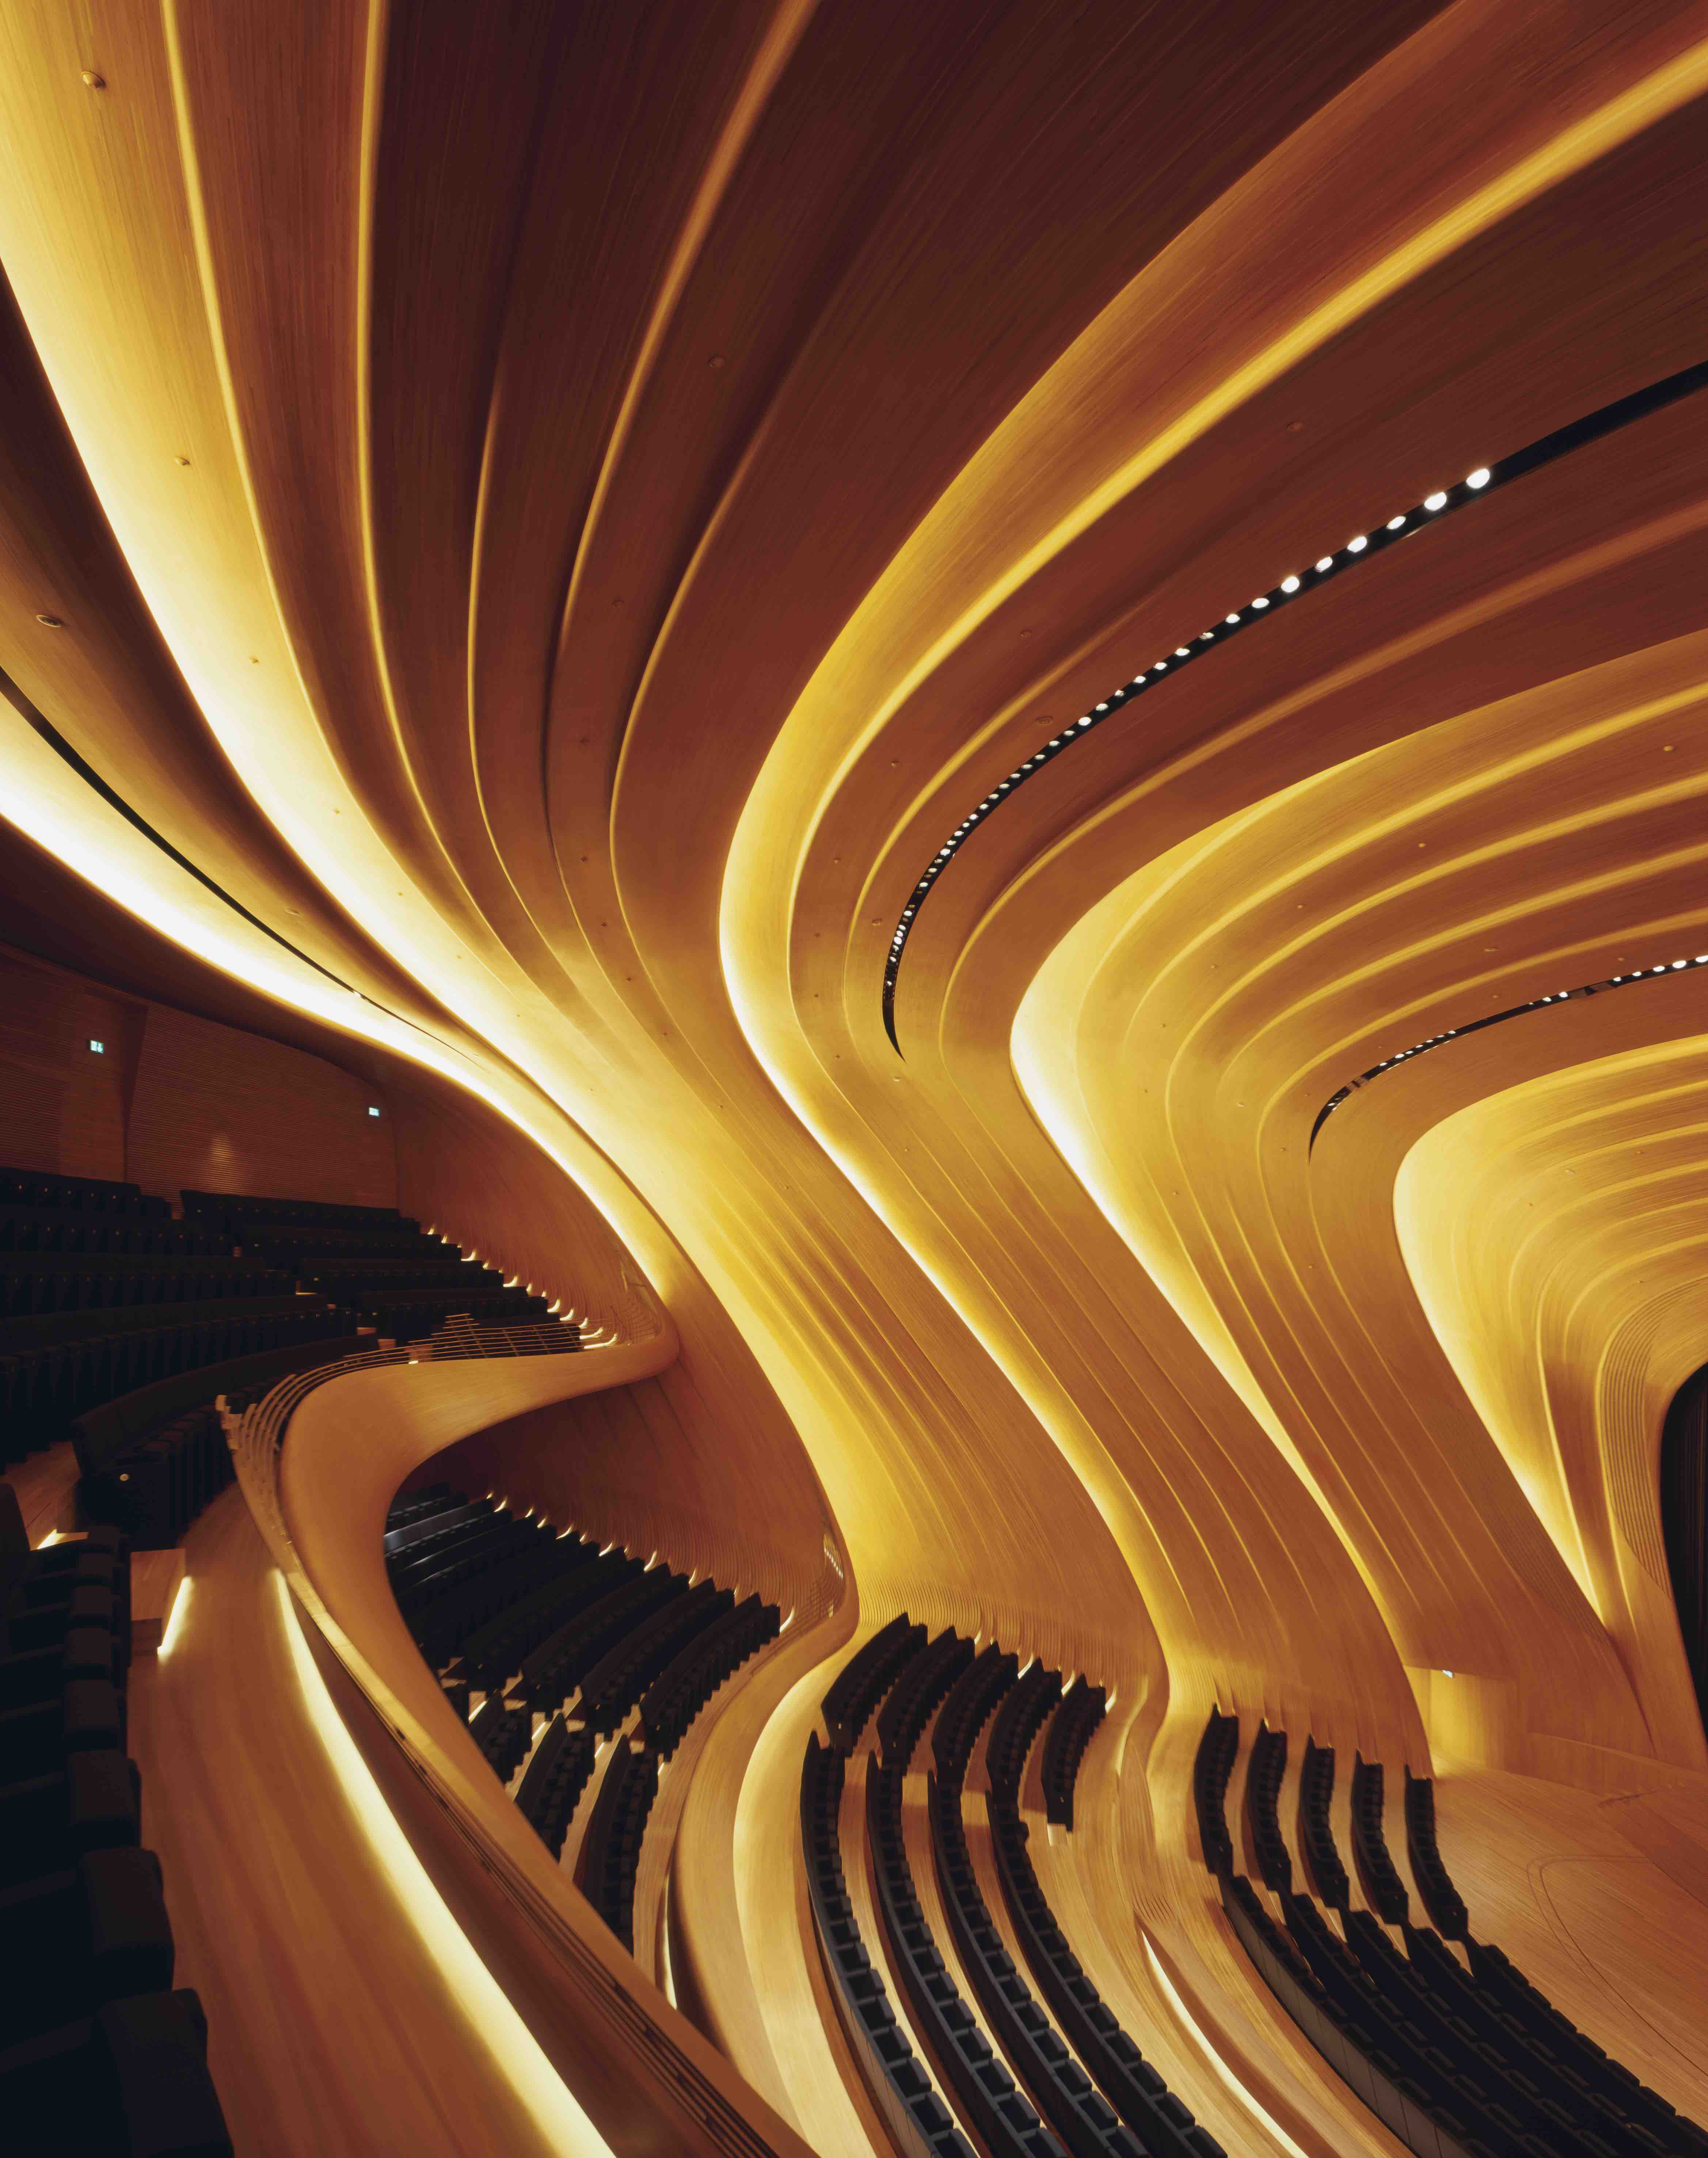 03. Haydar Aliyev Center, Baku_photo by Helene Binet